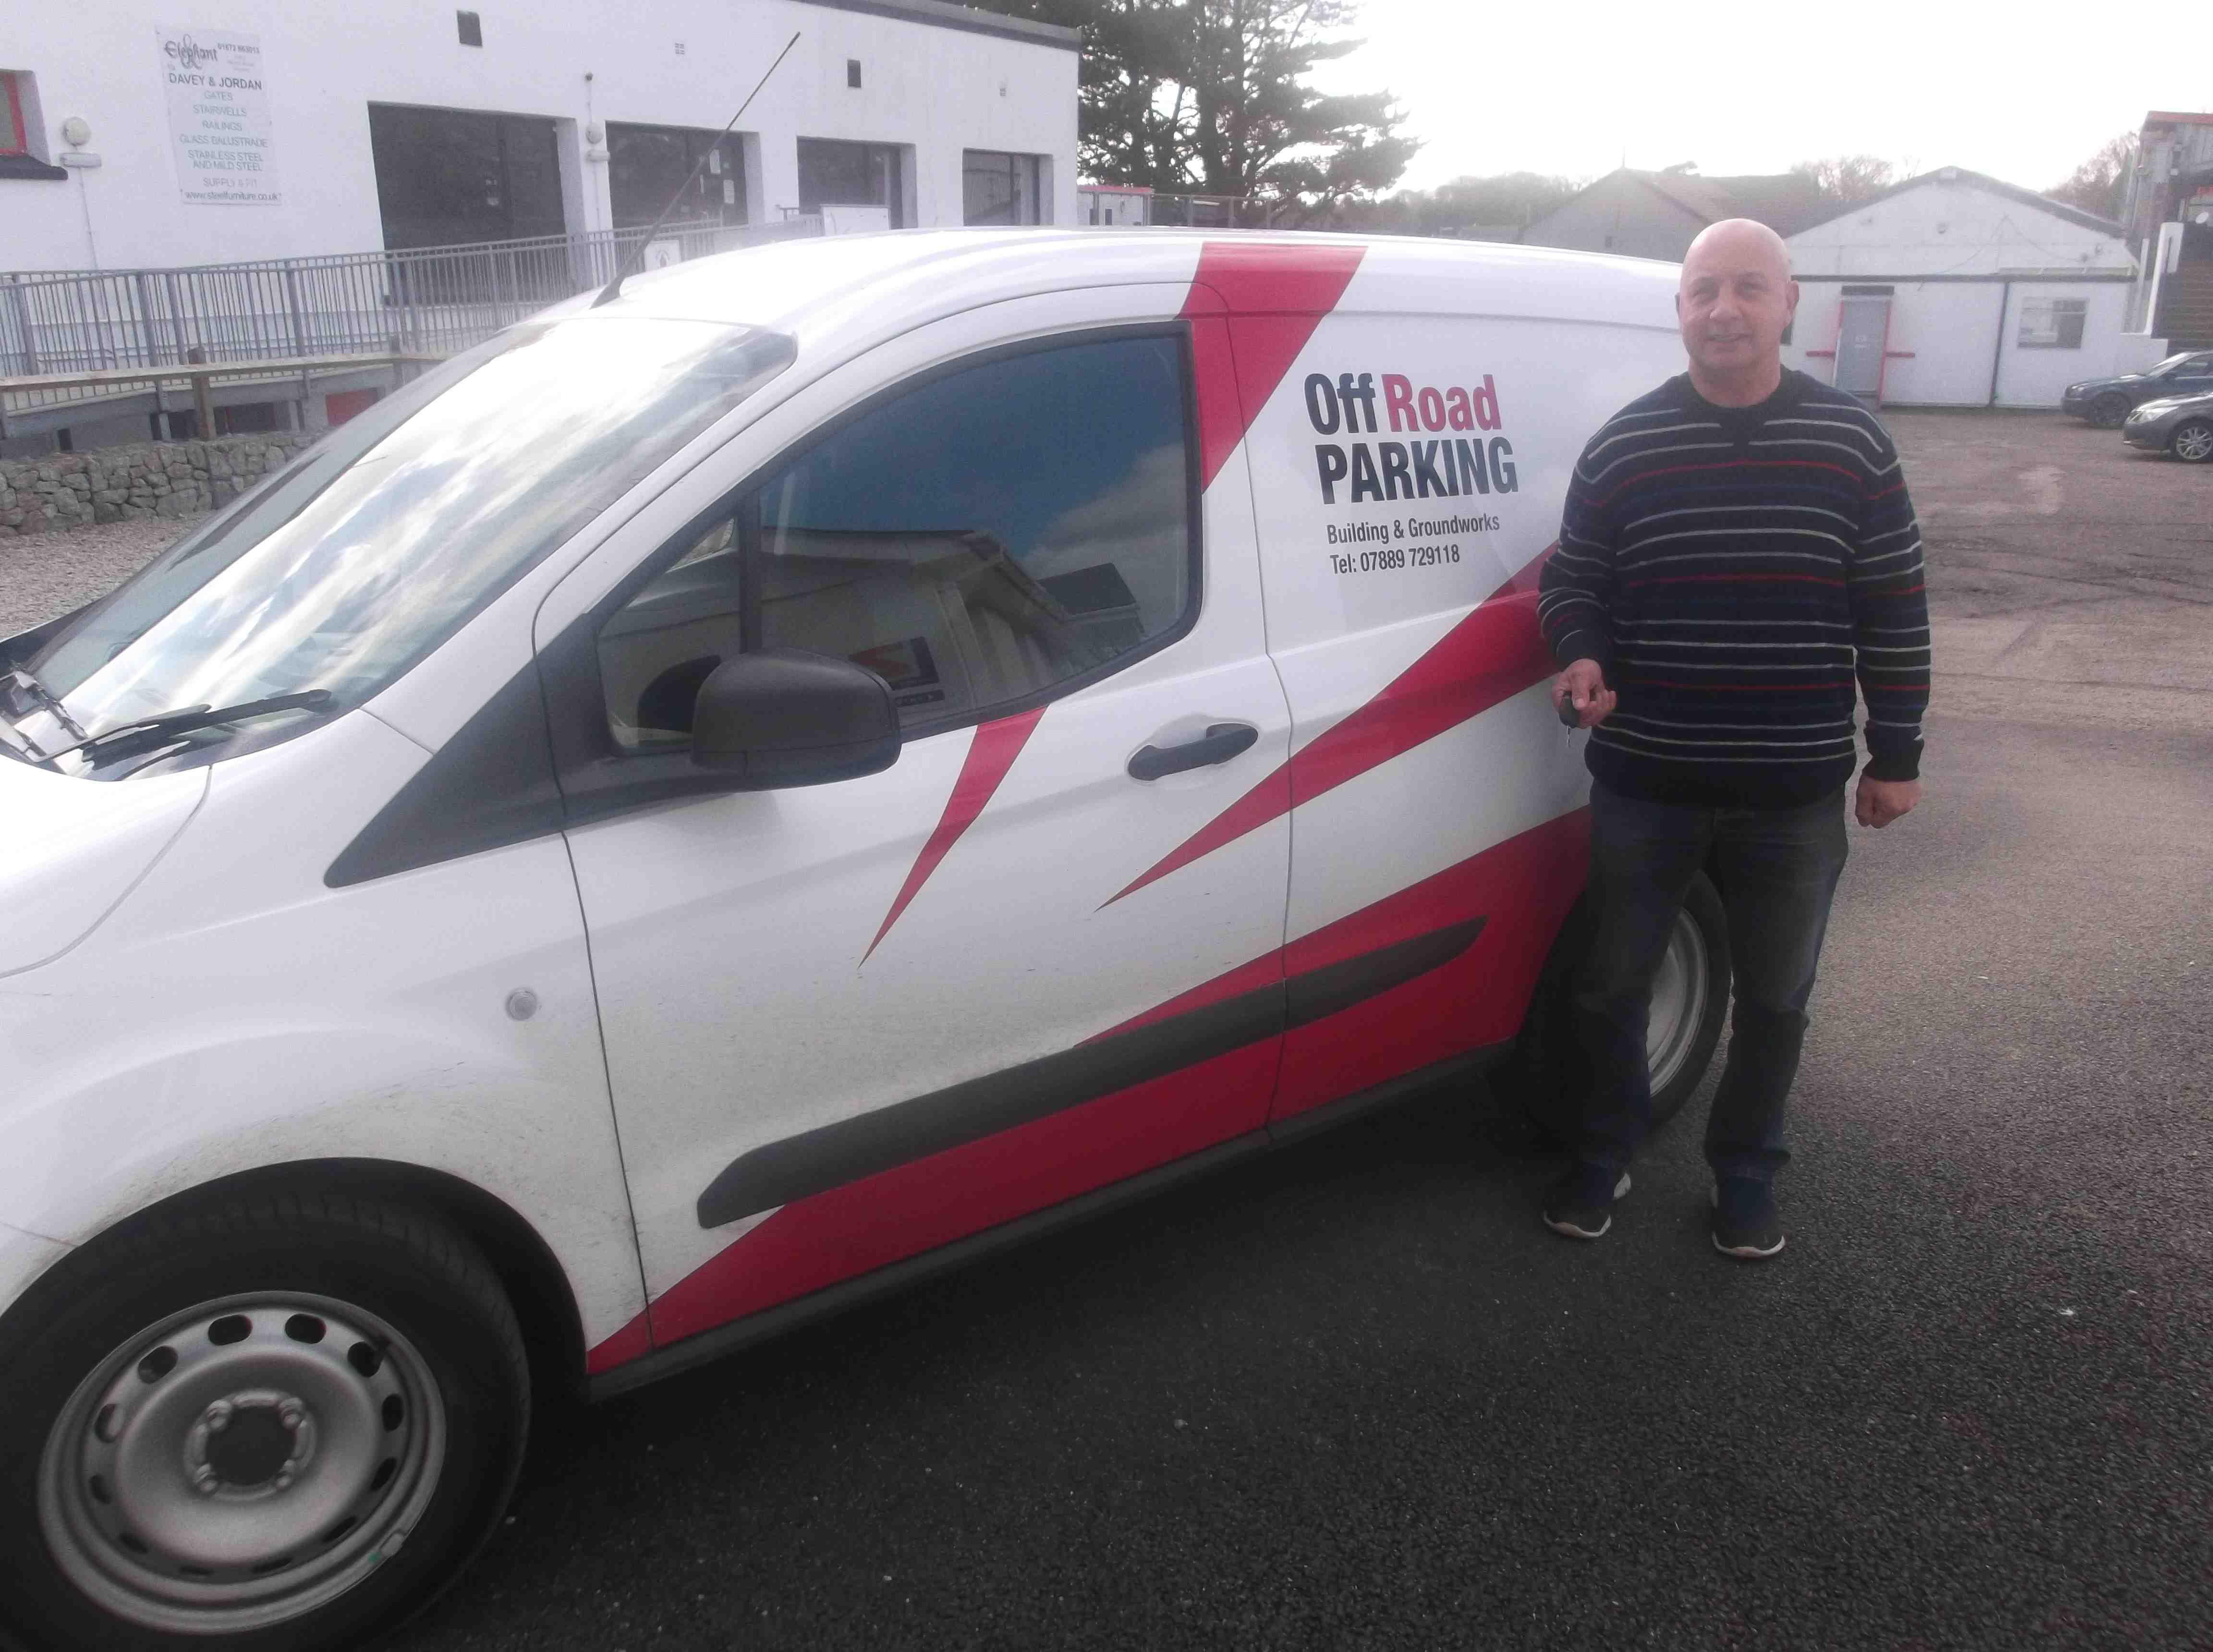 Trustford Raises 7 000 For Cancer Research Uk On Ebay Motor Trade News